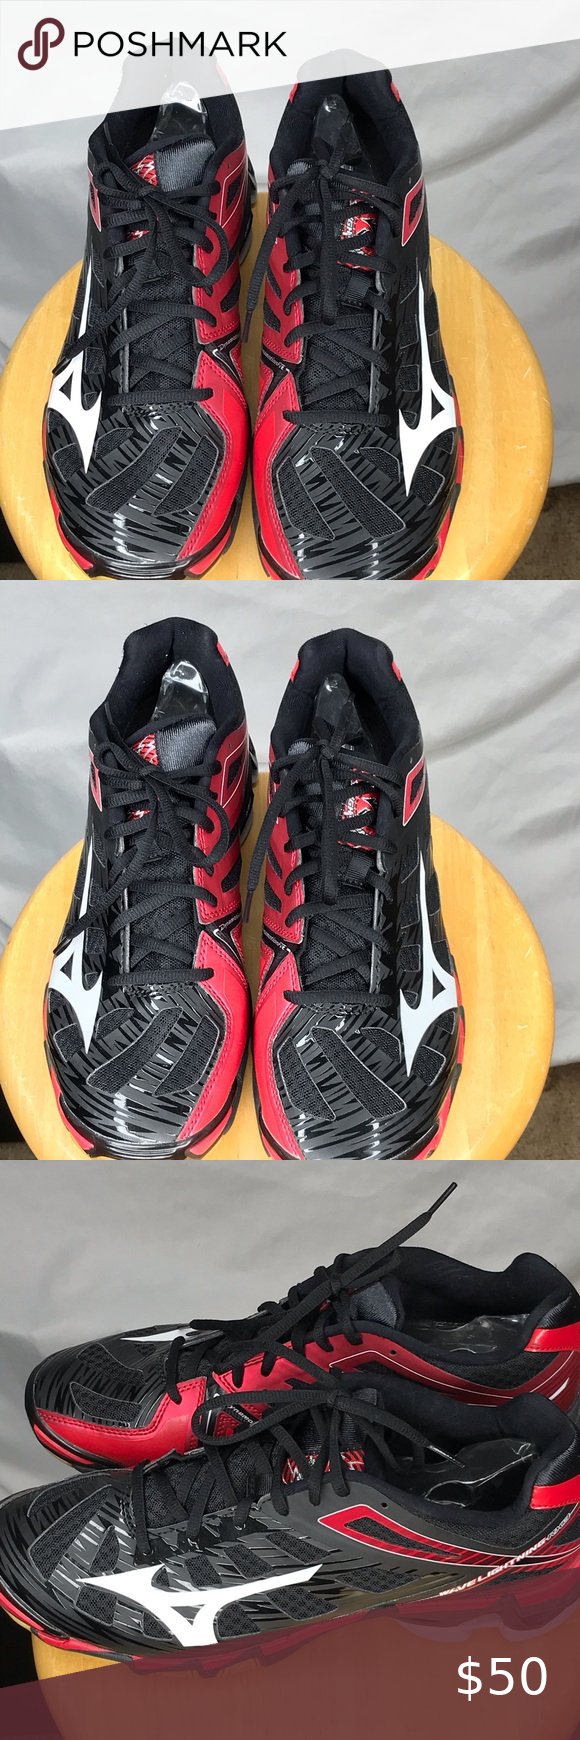 Mizuno Mens Wave Lightning Rx3 Volleyball Shoe 12w In 2020 Volleyball Shoes Mizuno Shoes Shoes